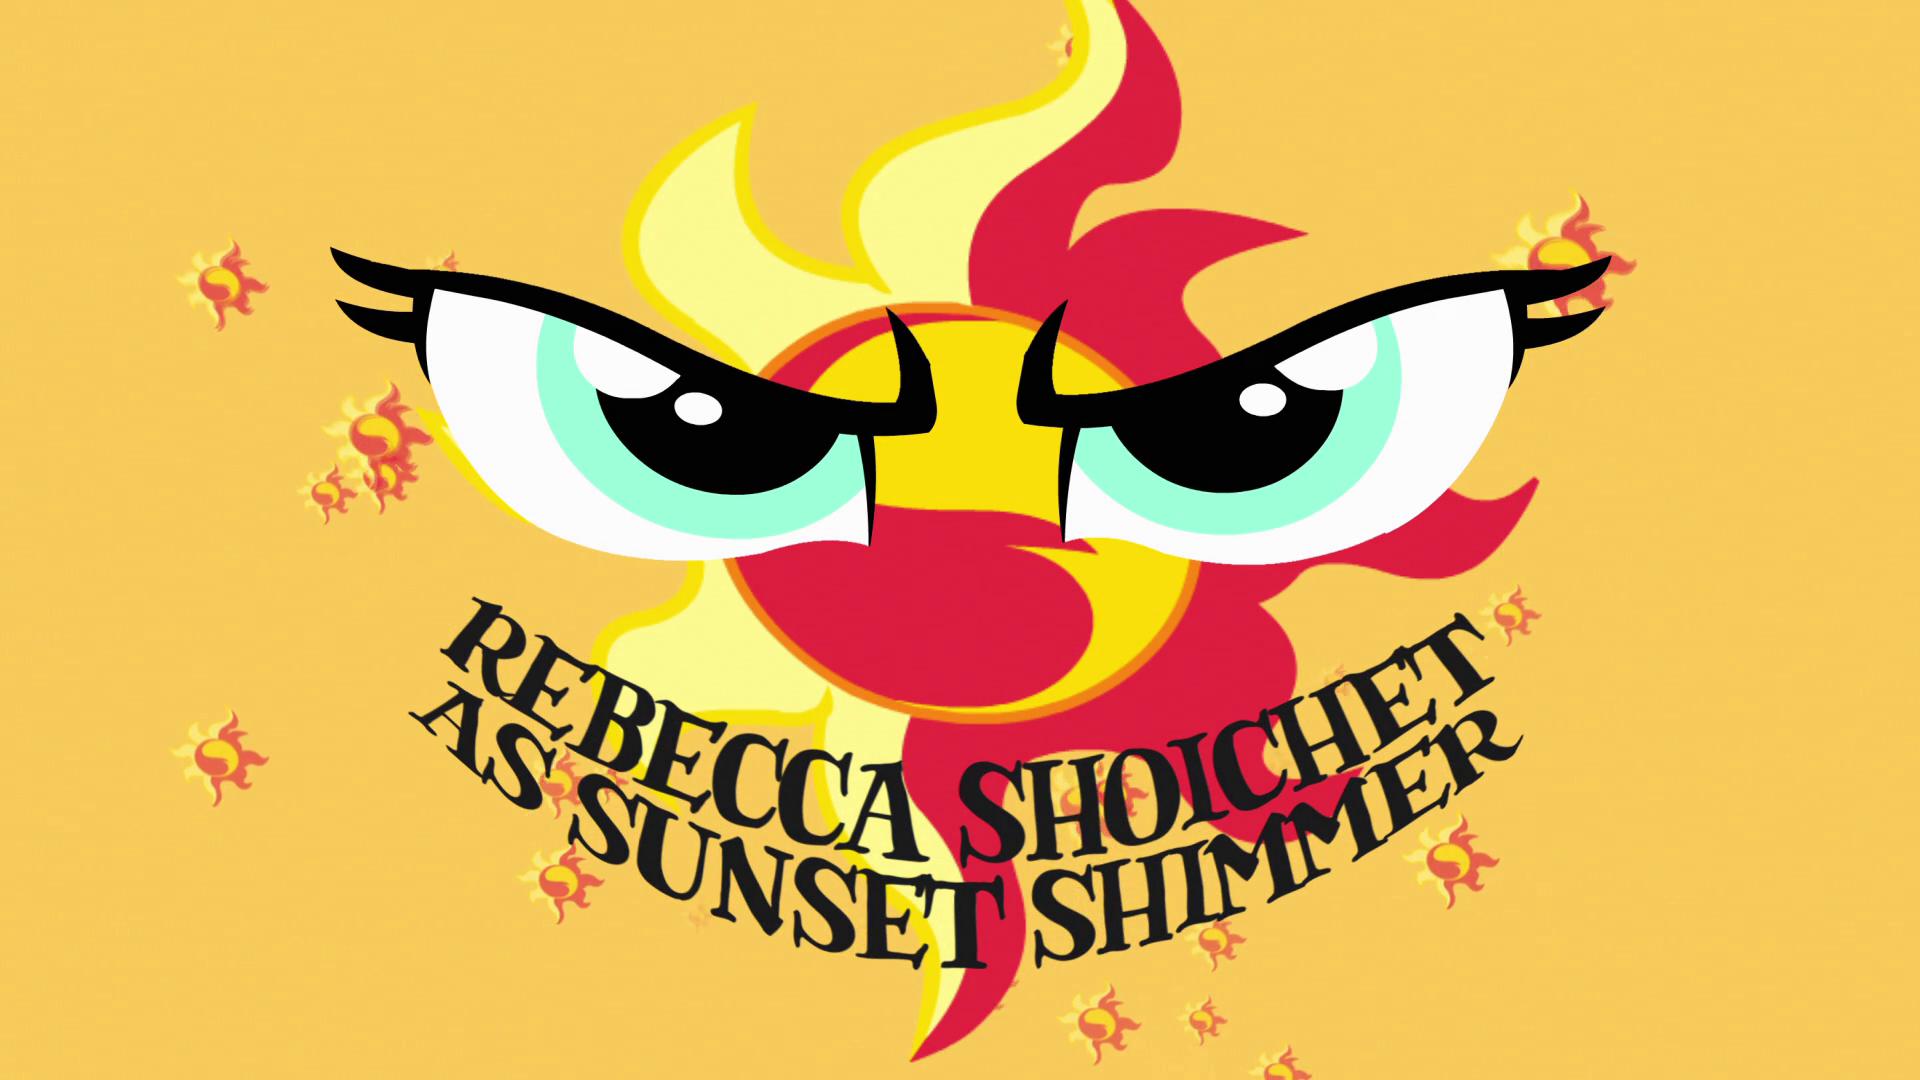 Archivo:Rebecca Shoichet credit sun flare EG opening.png